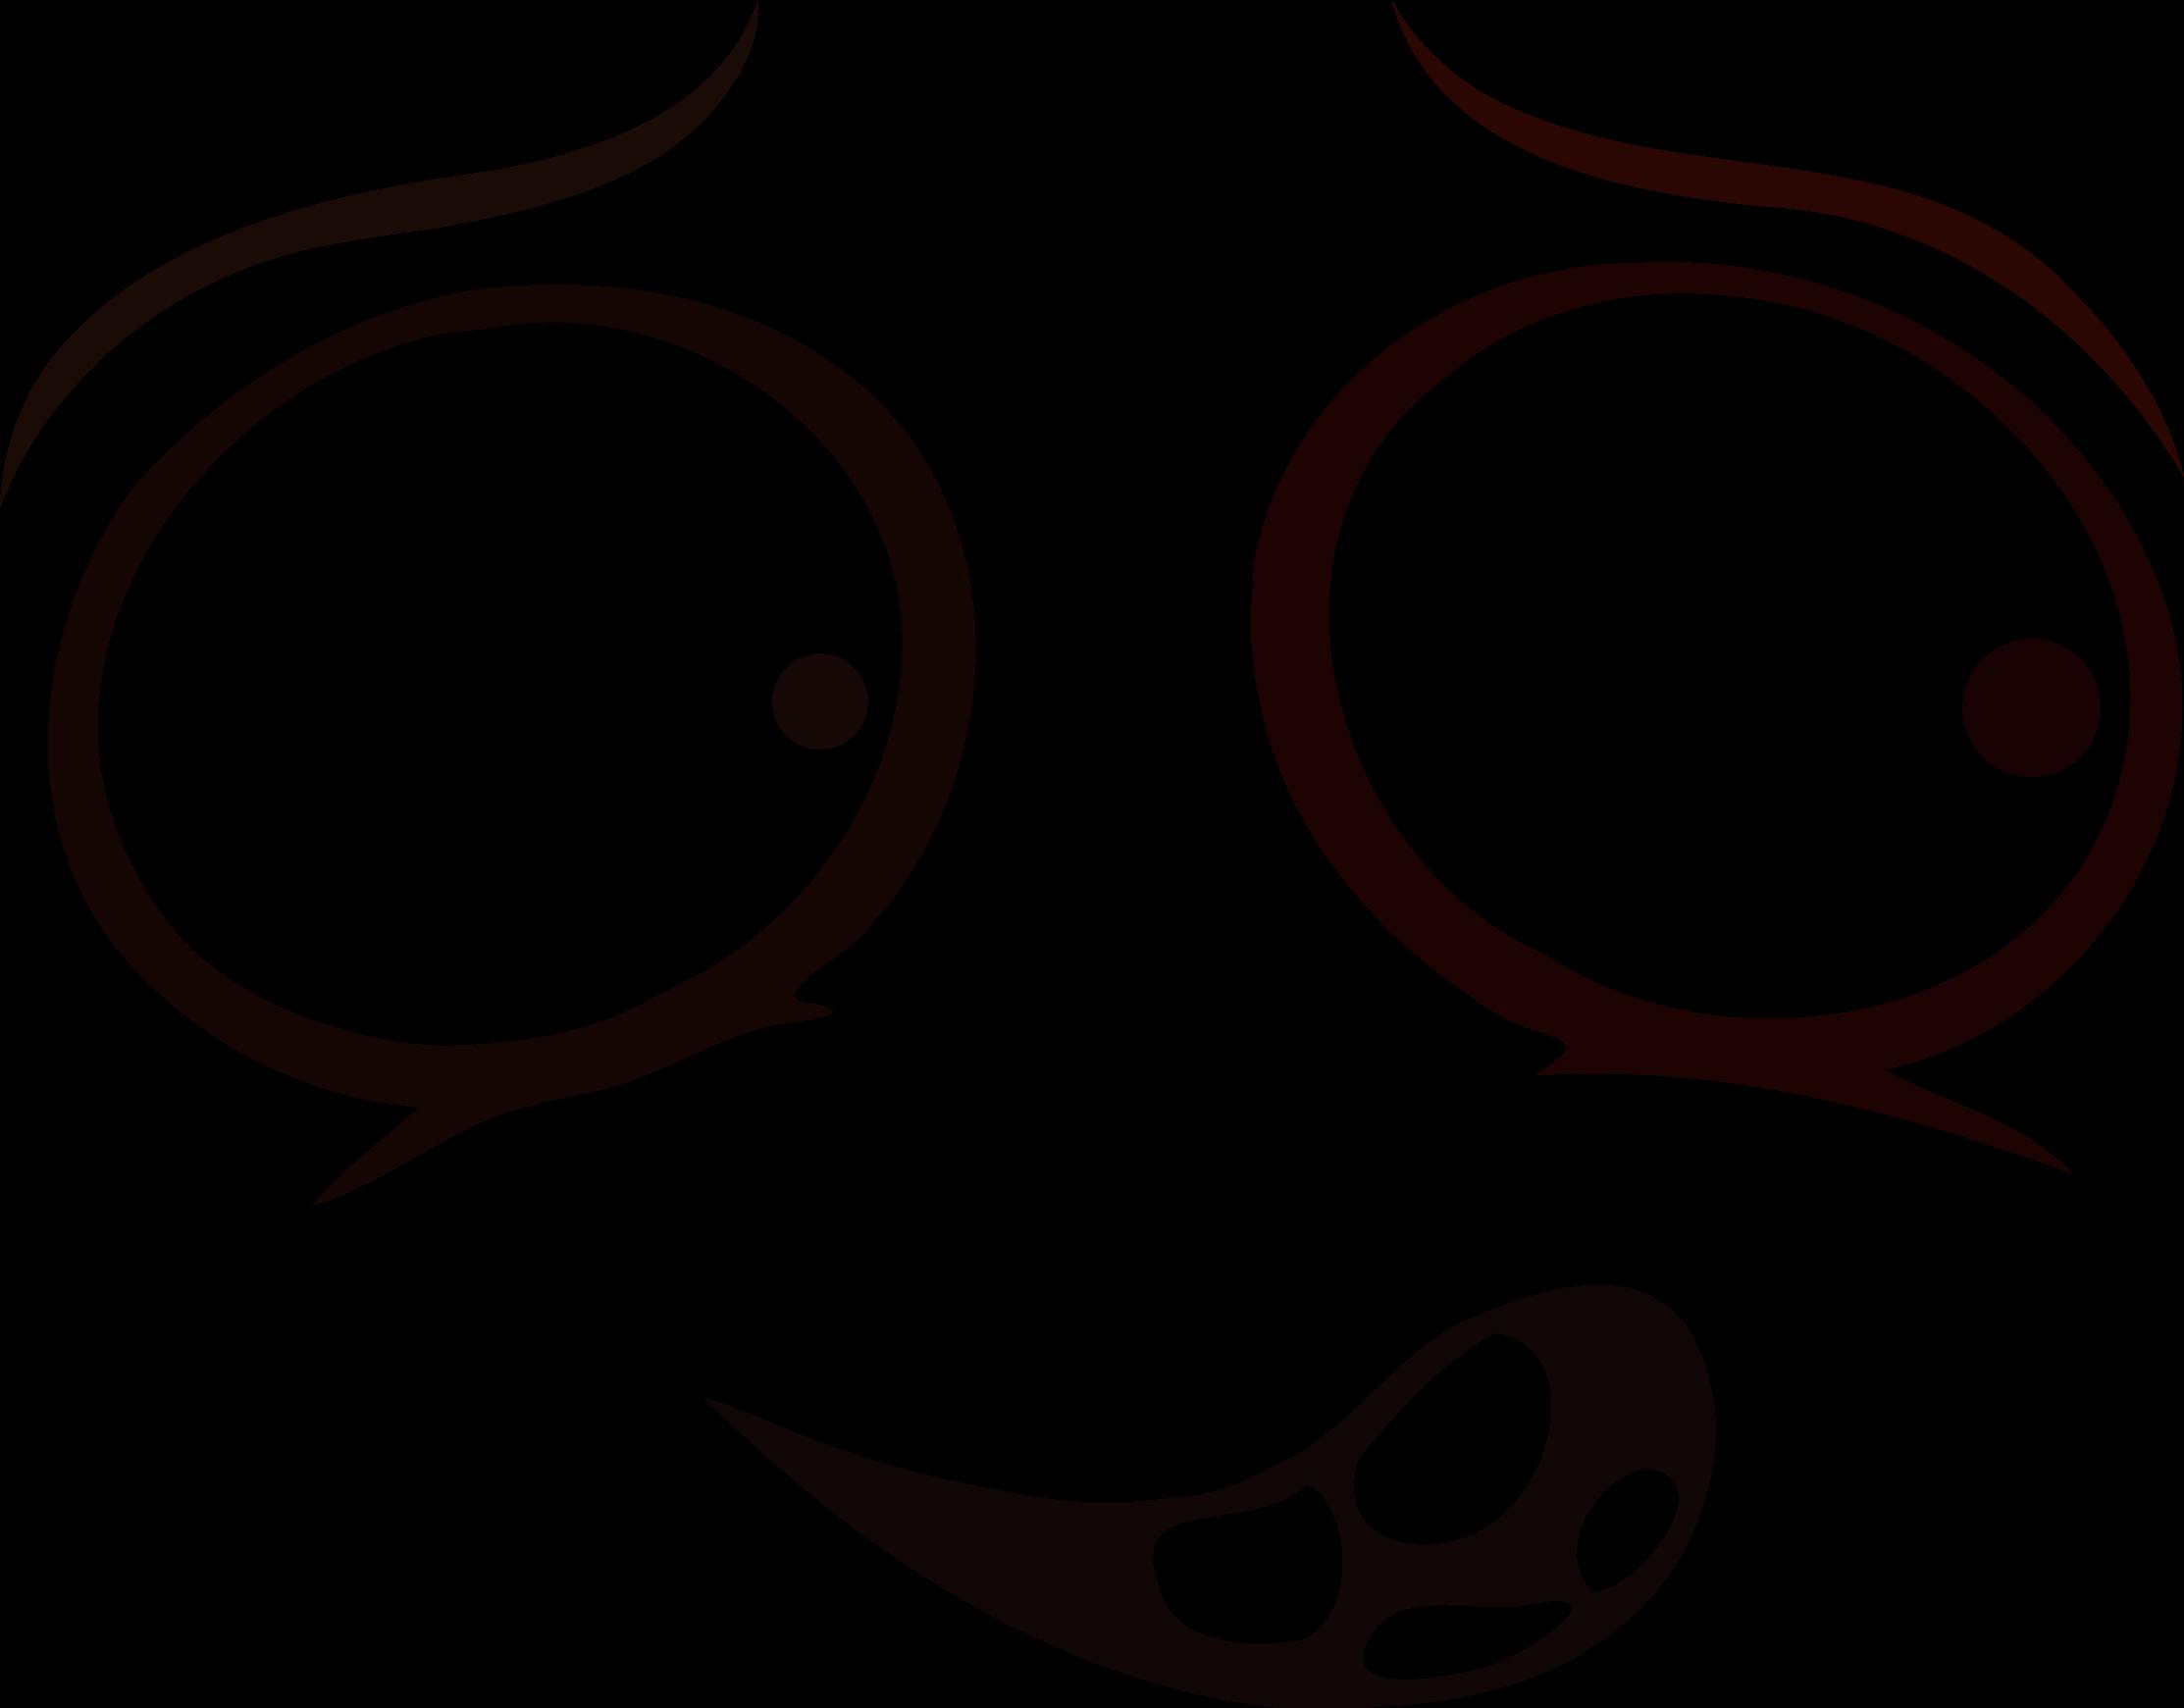 freeuse stock Clipart mentally deranged smiley. Vector emojis silhouette